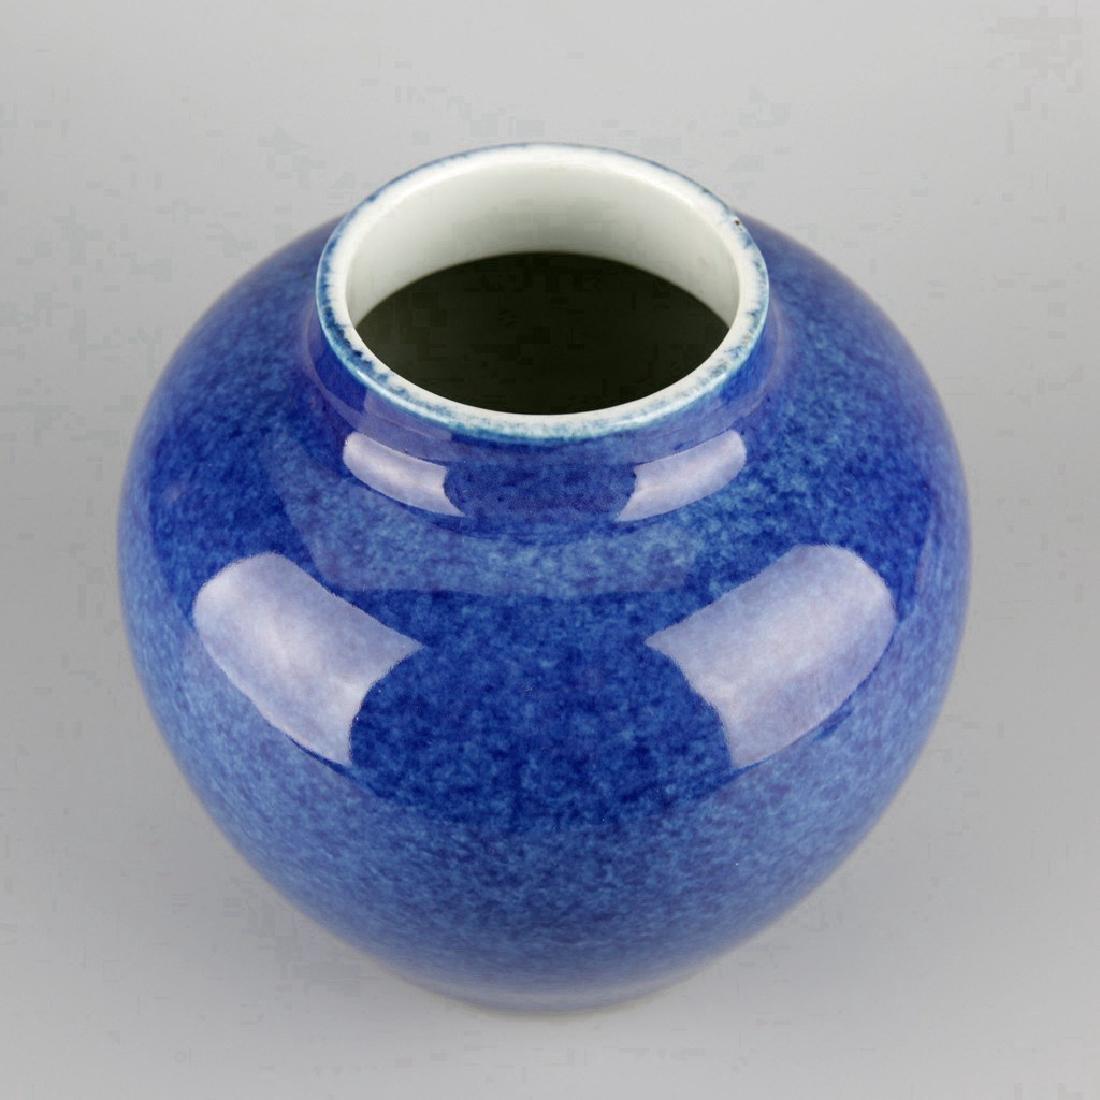 Chinese Porcelain Mottled Blue Vase - 2